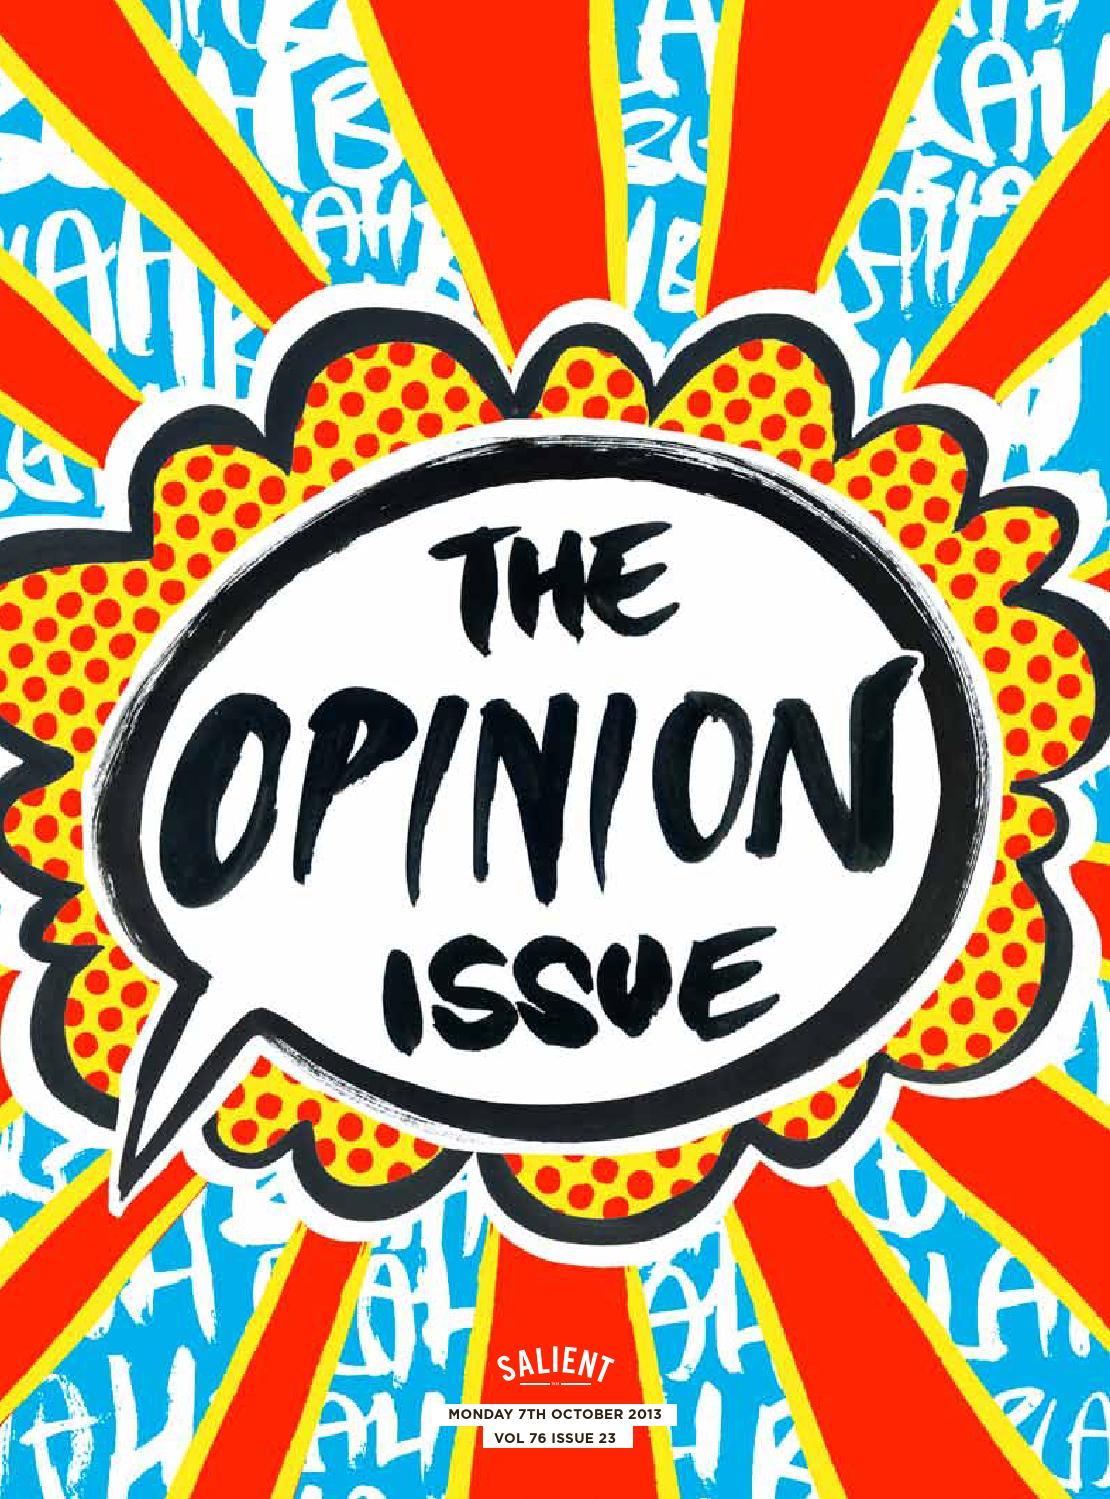 Salient 23 2013 The Opinion Issue By Issuu Nokha Rider Coffee Black Men Cokelat Tua 39